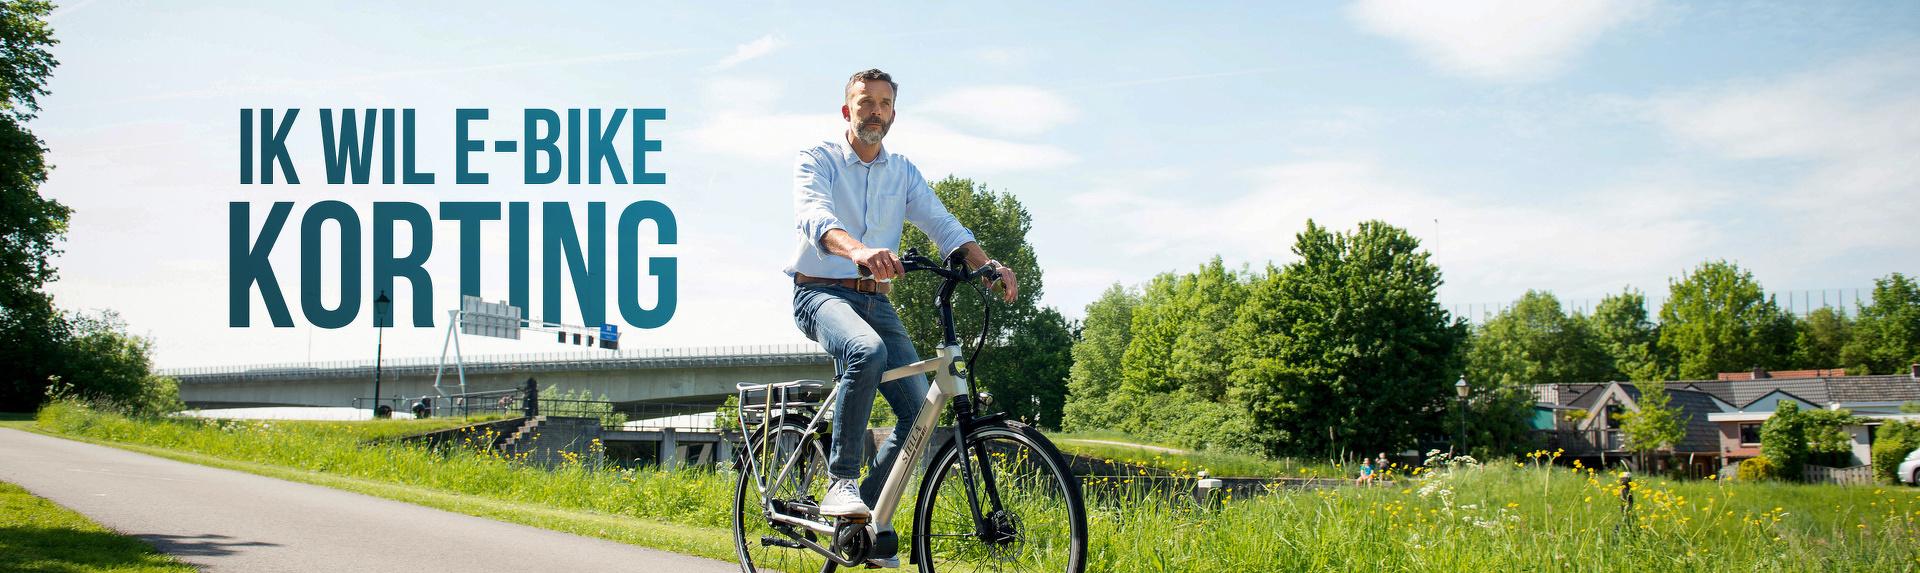 E-bike subsidie voor werknemers Utrecht en Amersfoort